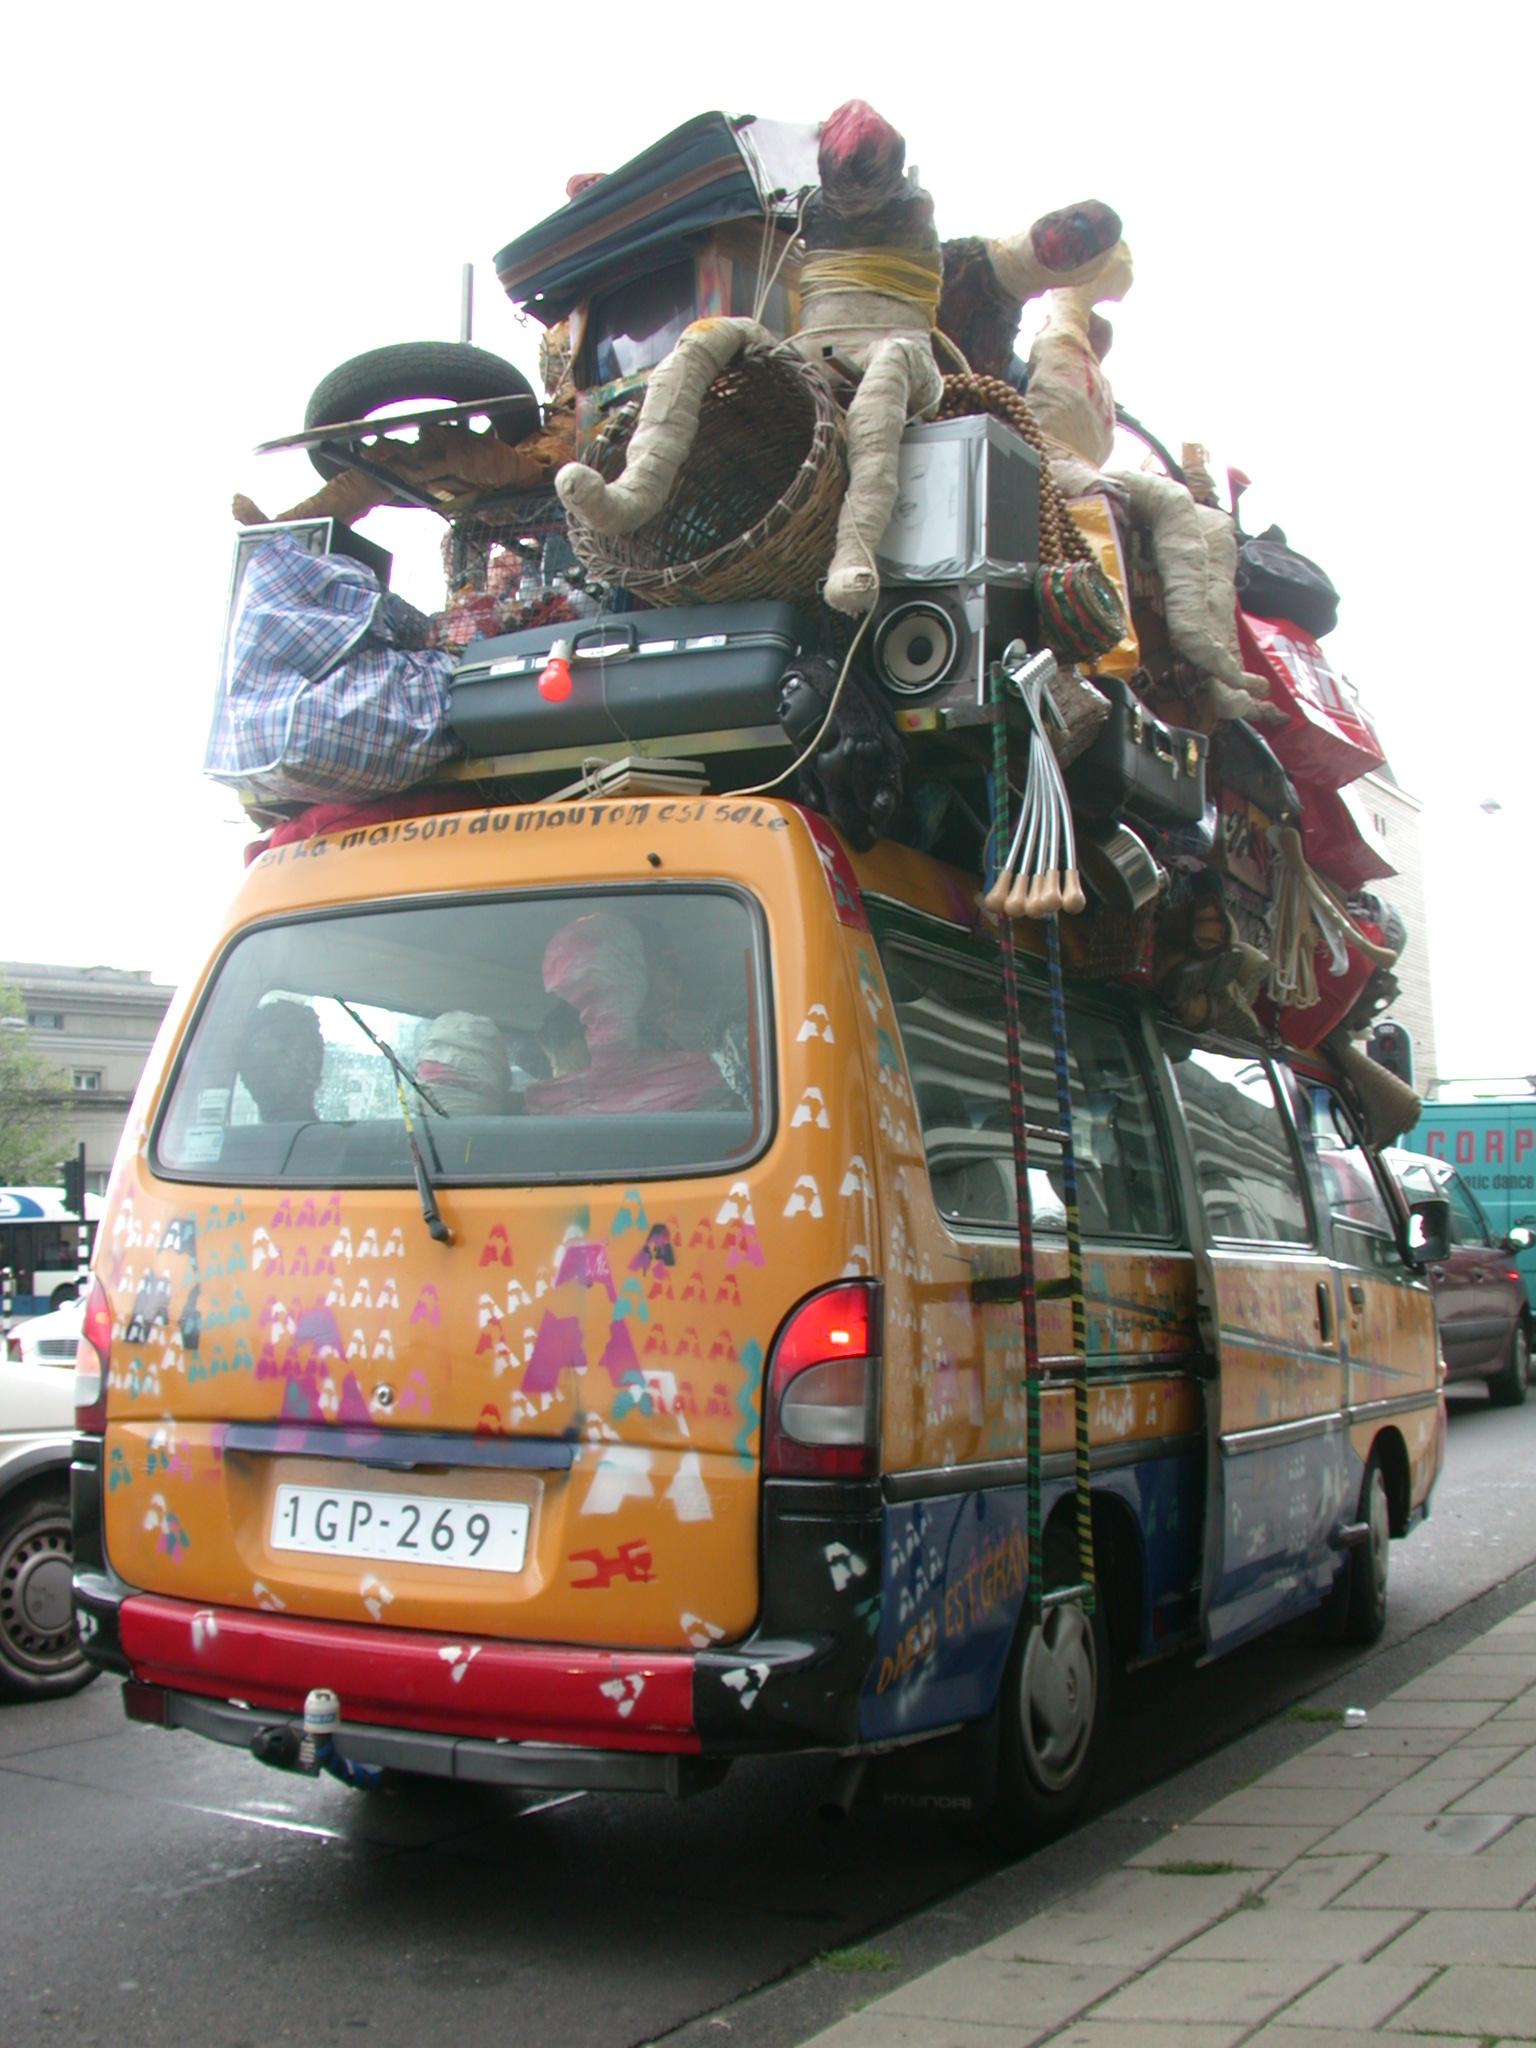 vehicles land taxi art african car van luggage baggage jampacked royalty-free